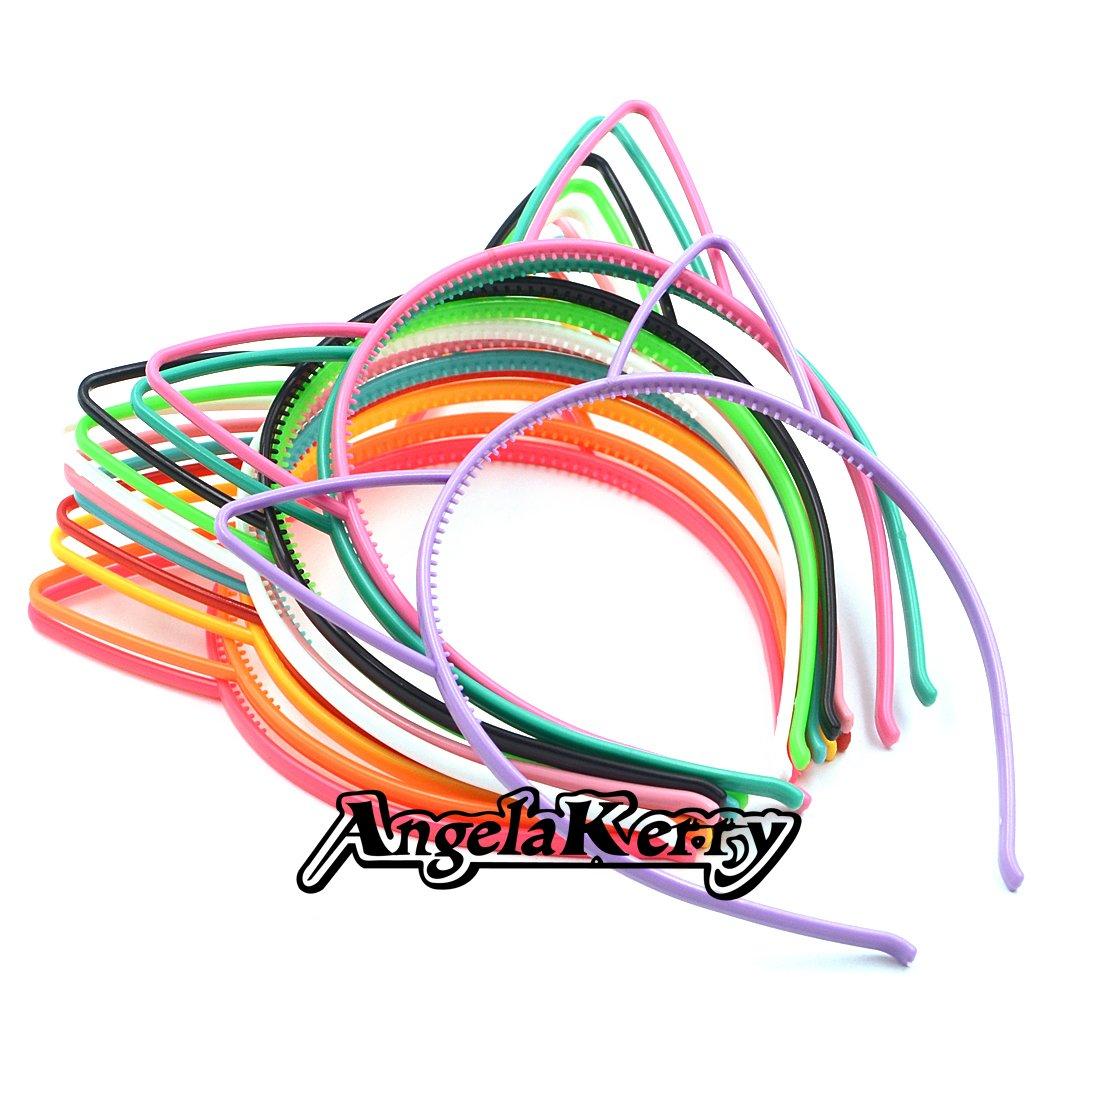 Amazon.com : AngelaKerry 10pcs Black Cat Ear Plastic Headbands Hairbands Bow for Girls Fashion Party DIY (Black, Pack of 10pcs) : Beauty